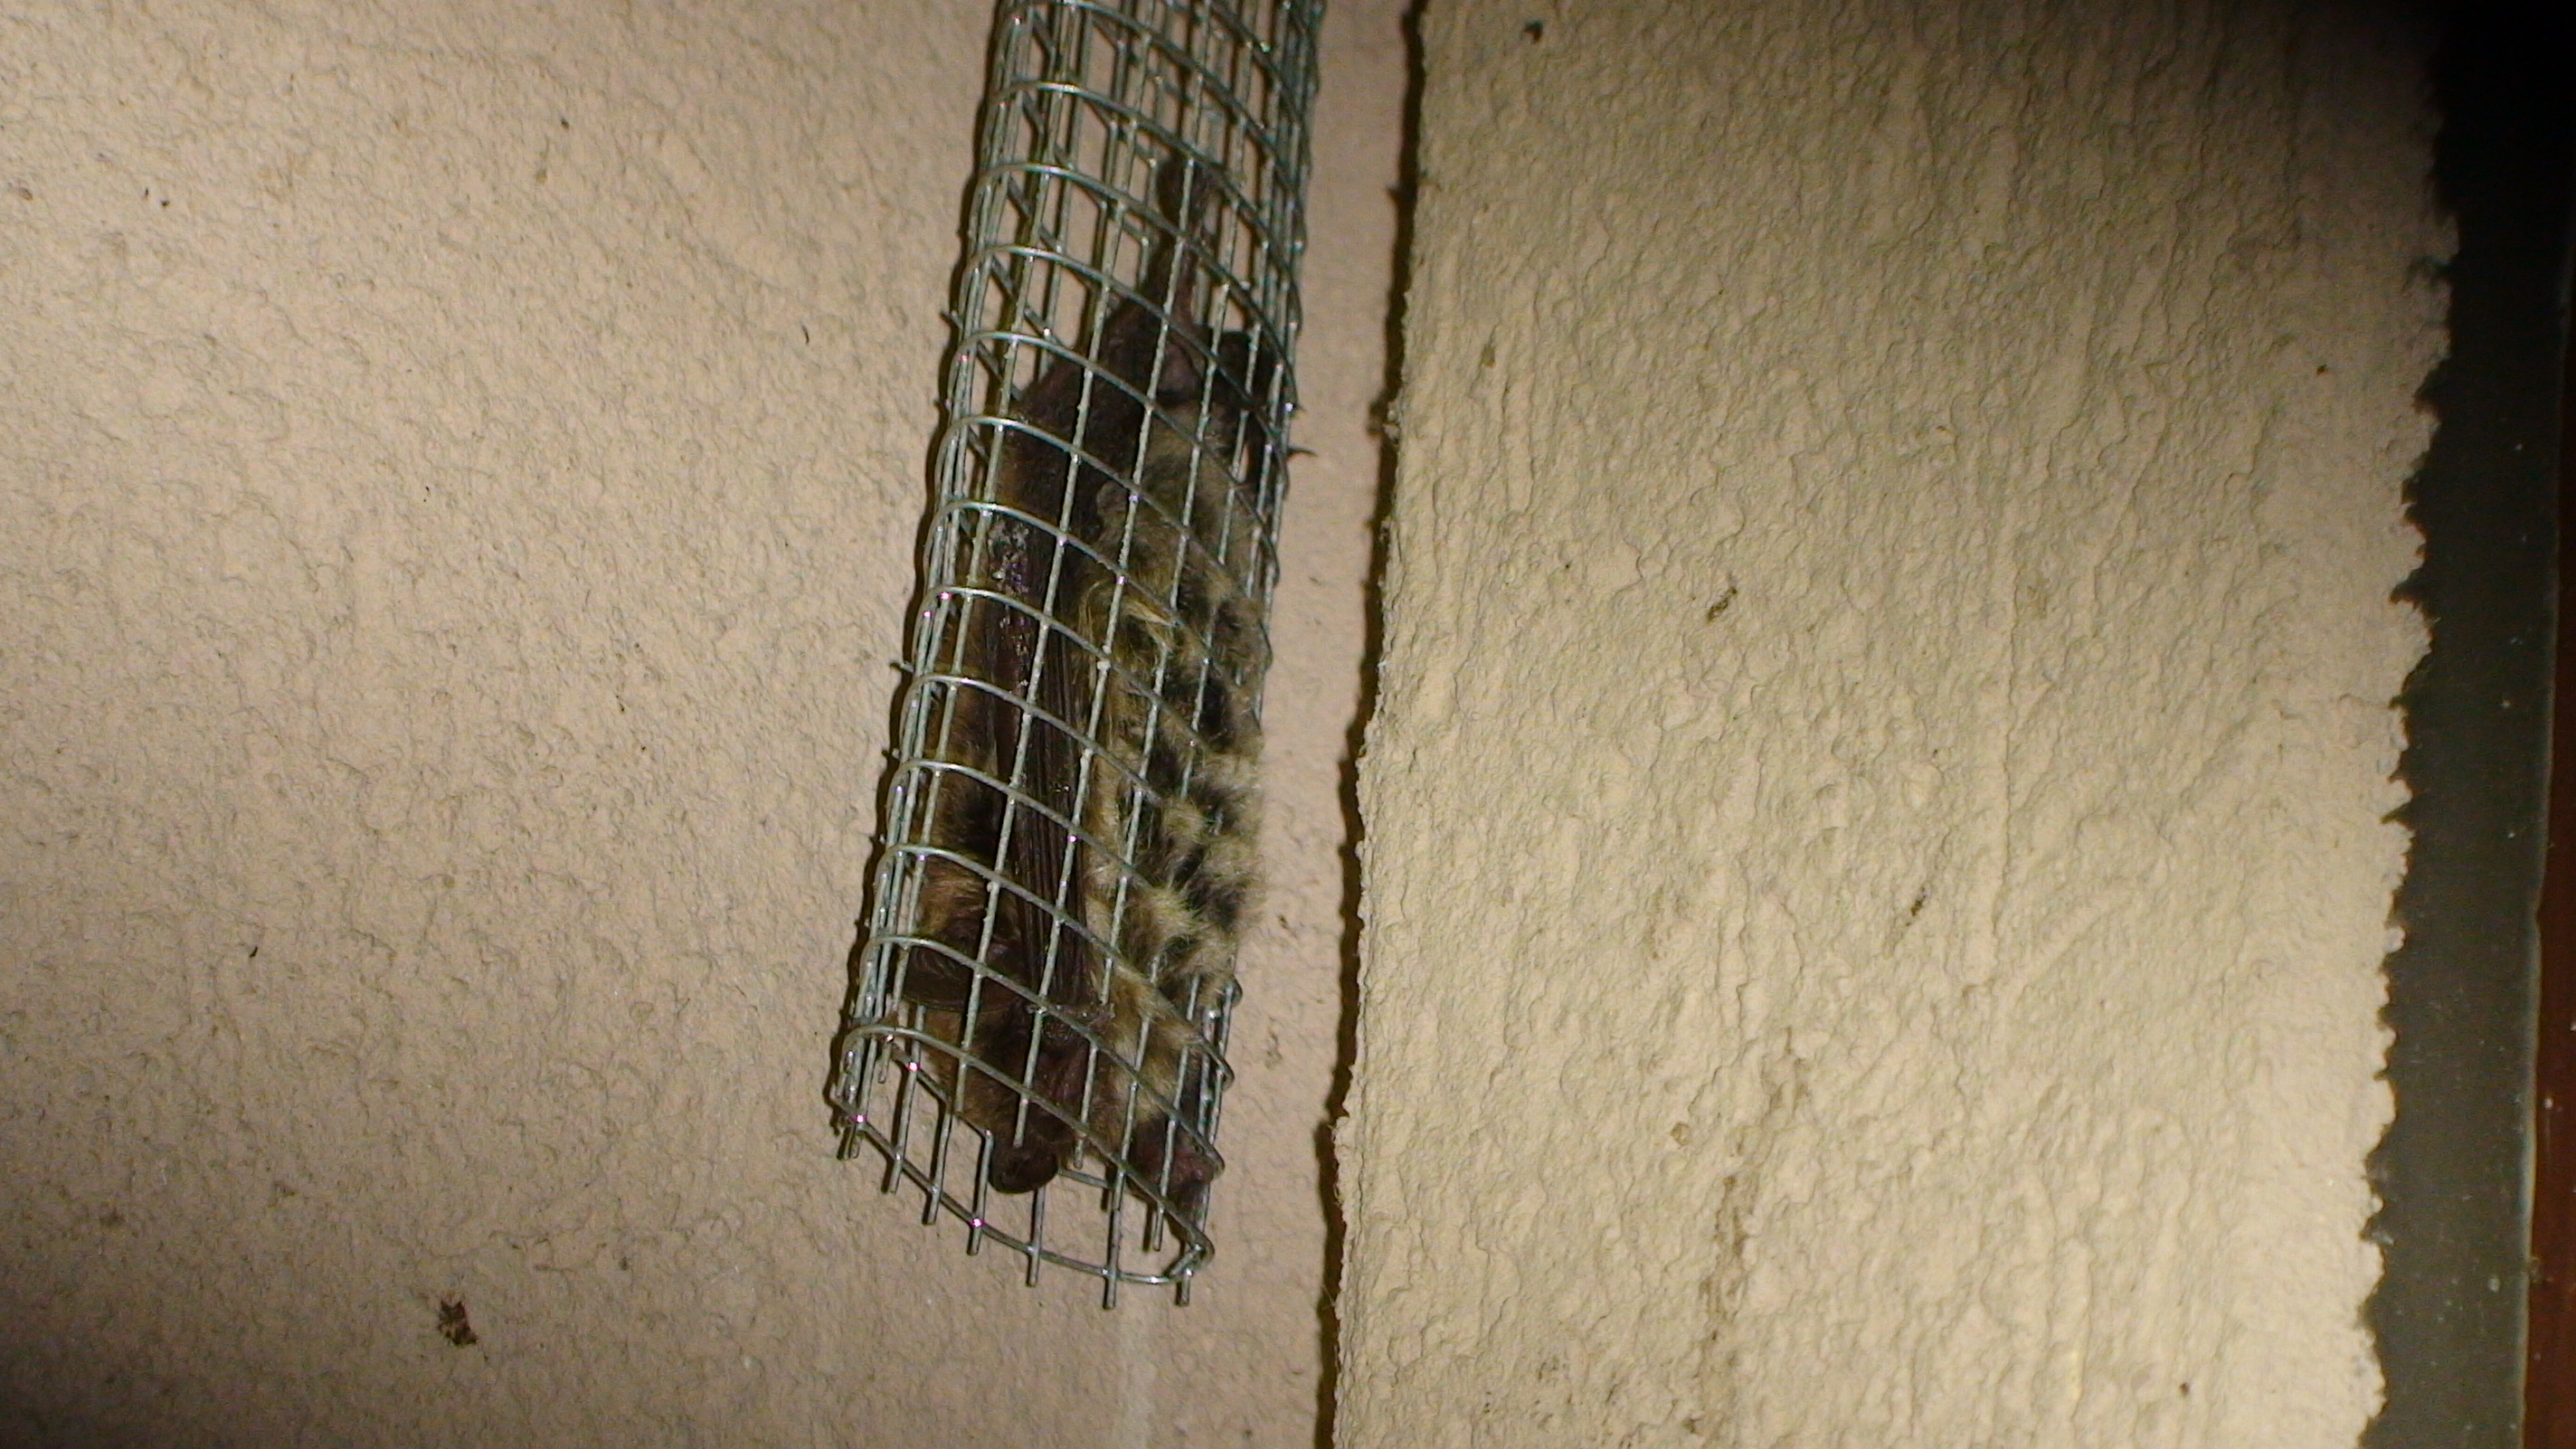 Bat Removal & Bat Control   Dane County Bat Removal